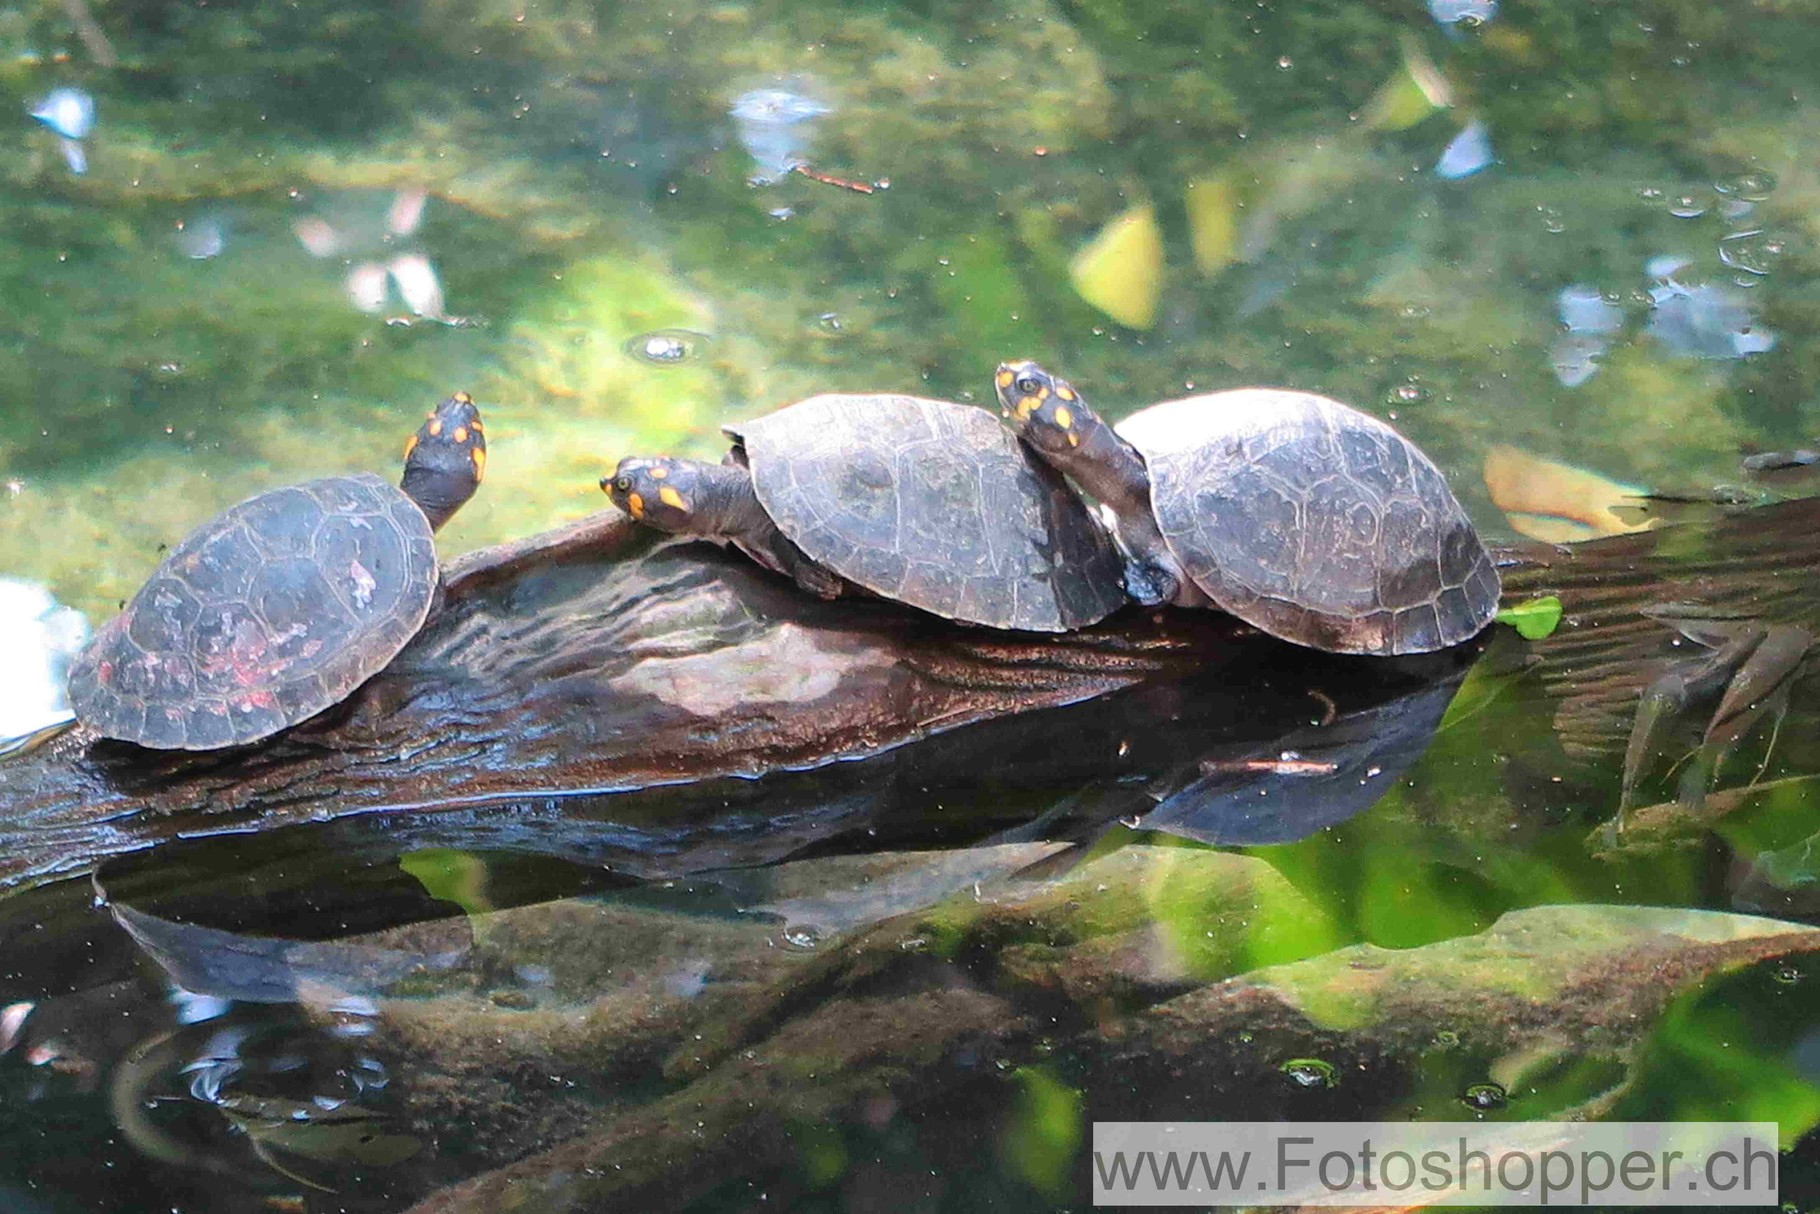 Schützenswerte Schidkröten